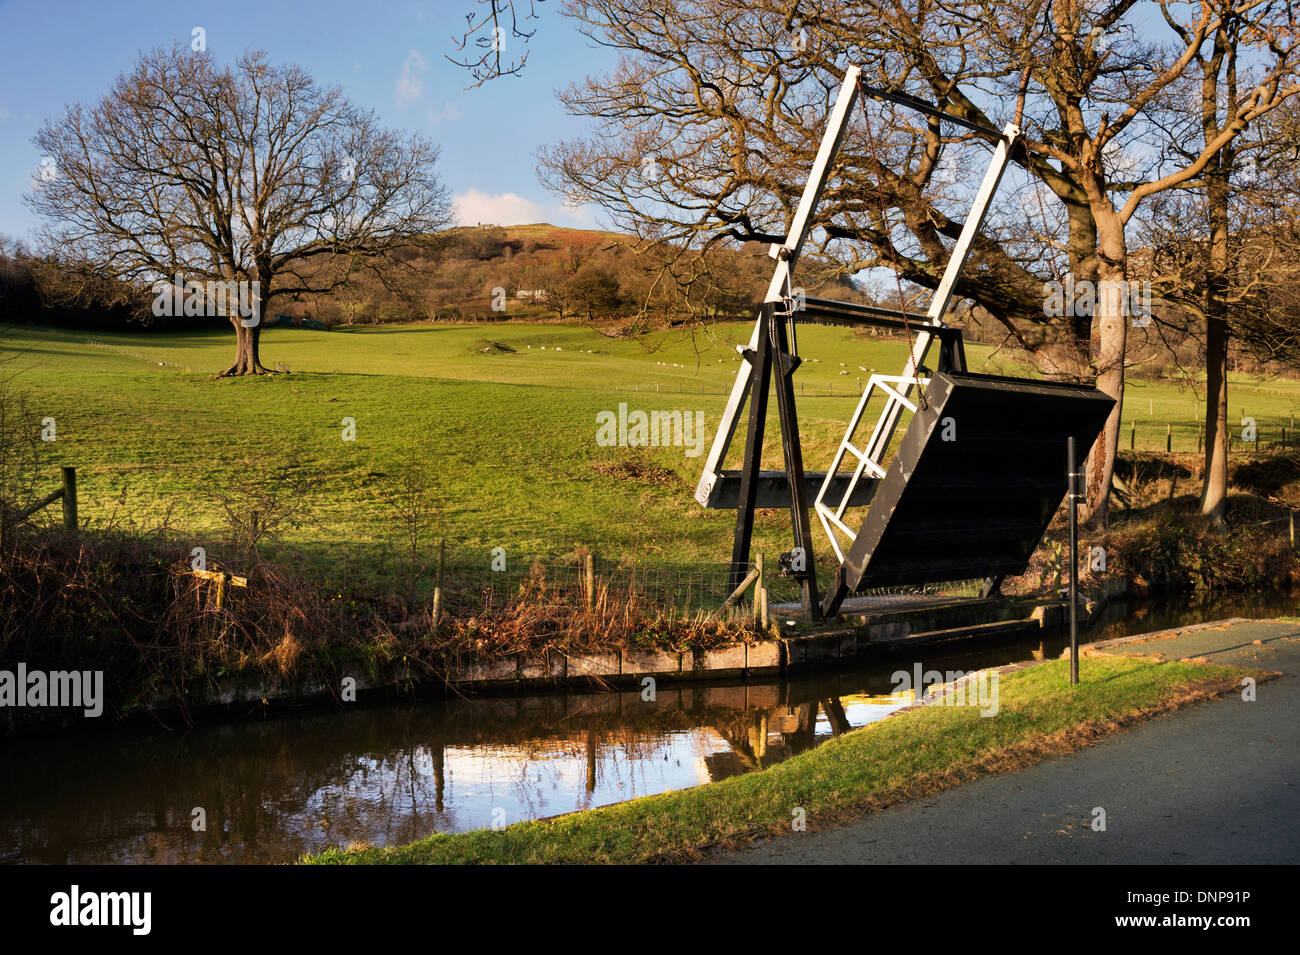 Lift bridge on the Lllangollen Canal, near the Welsh town of Llangollen, UK - Stock Image